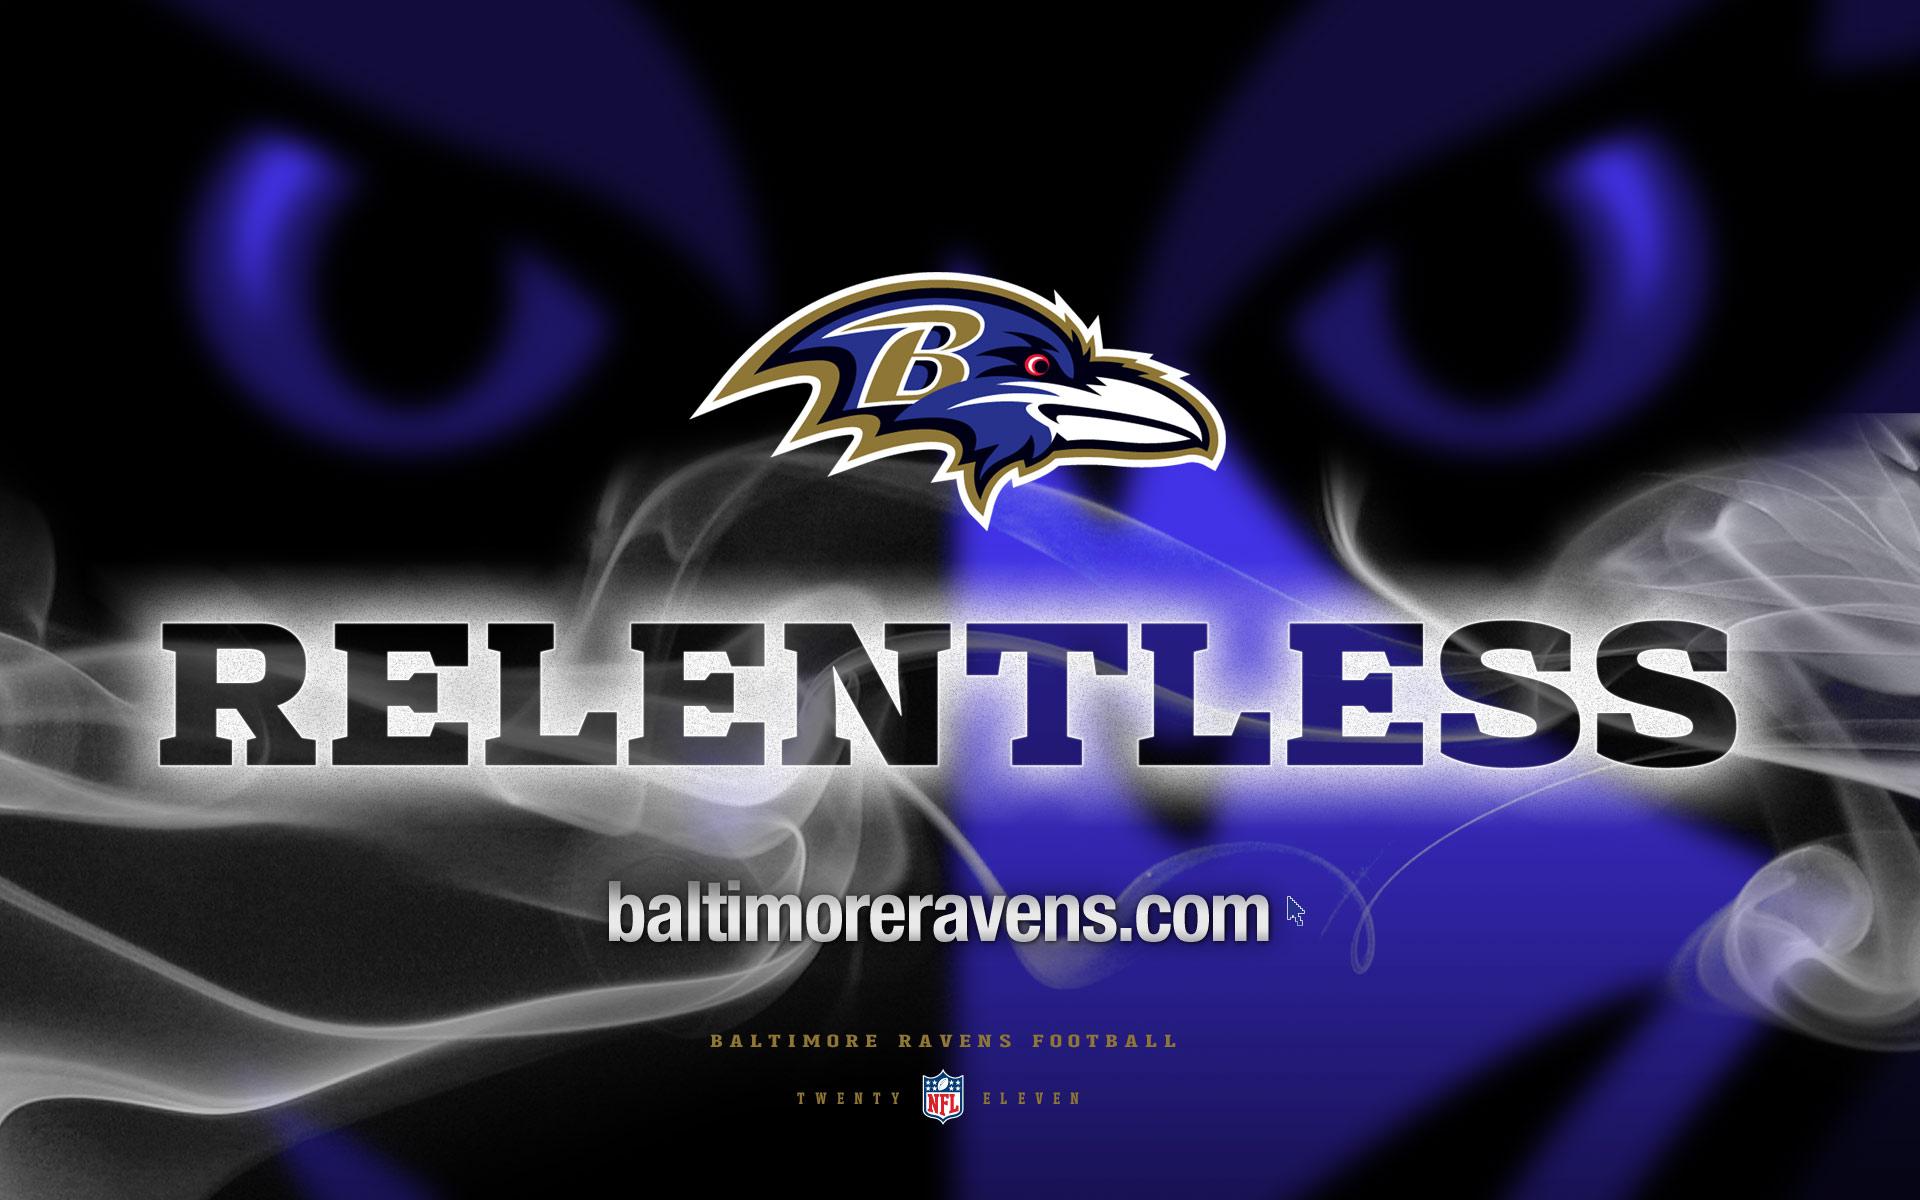 Baltimore Ravens wallpaper desktop wallpaper Baltimore Ravens 1920x1200